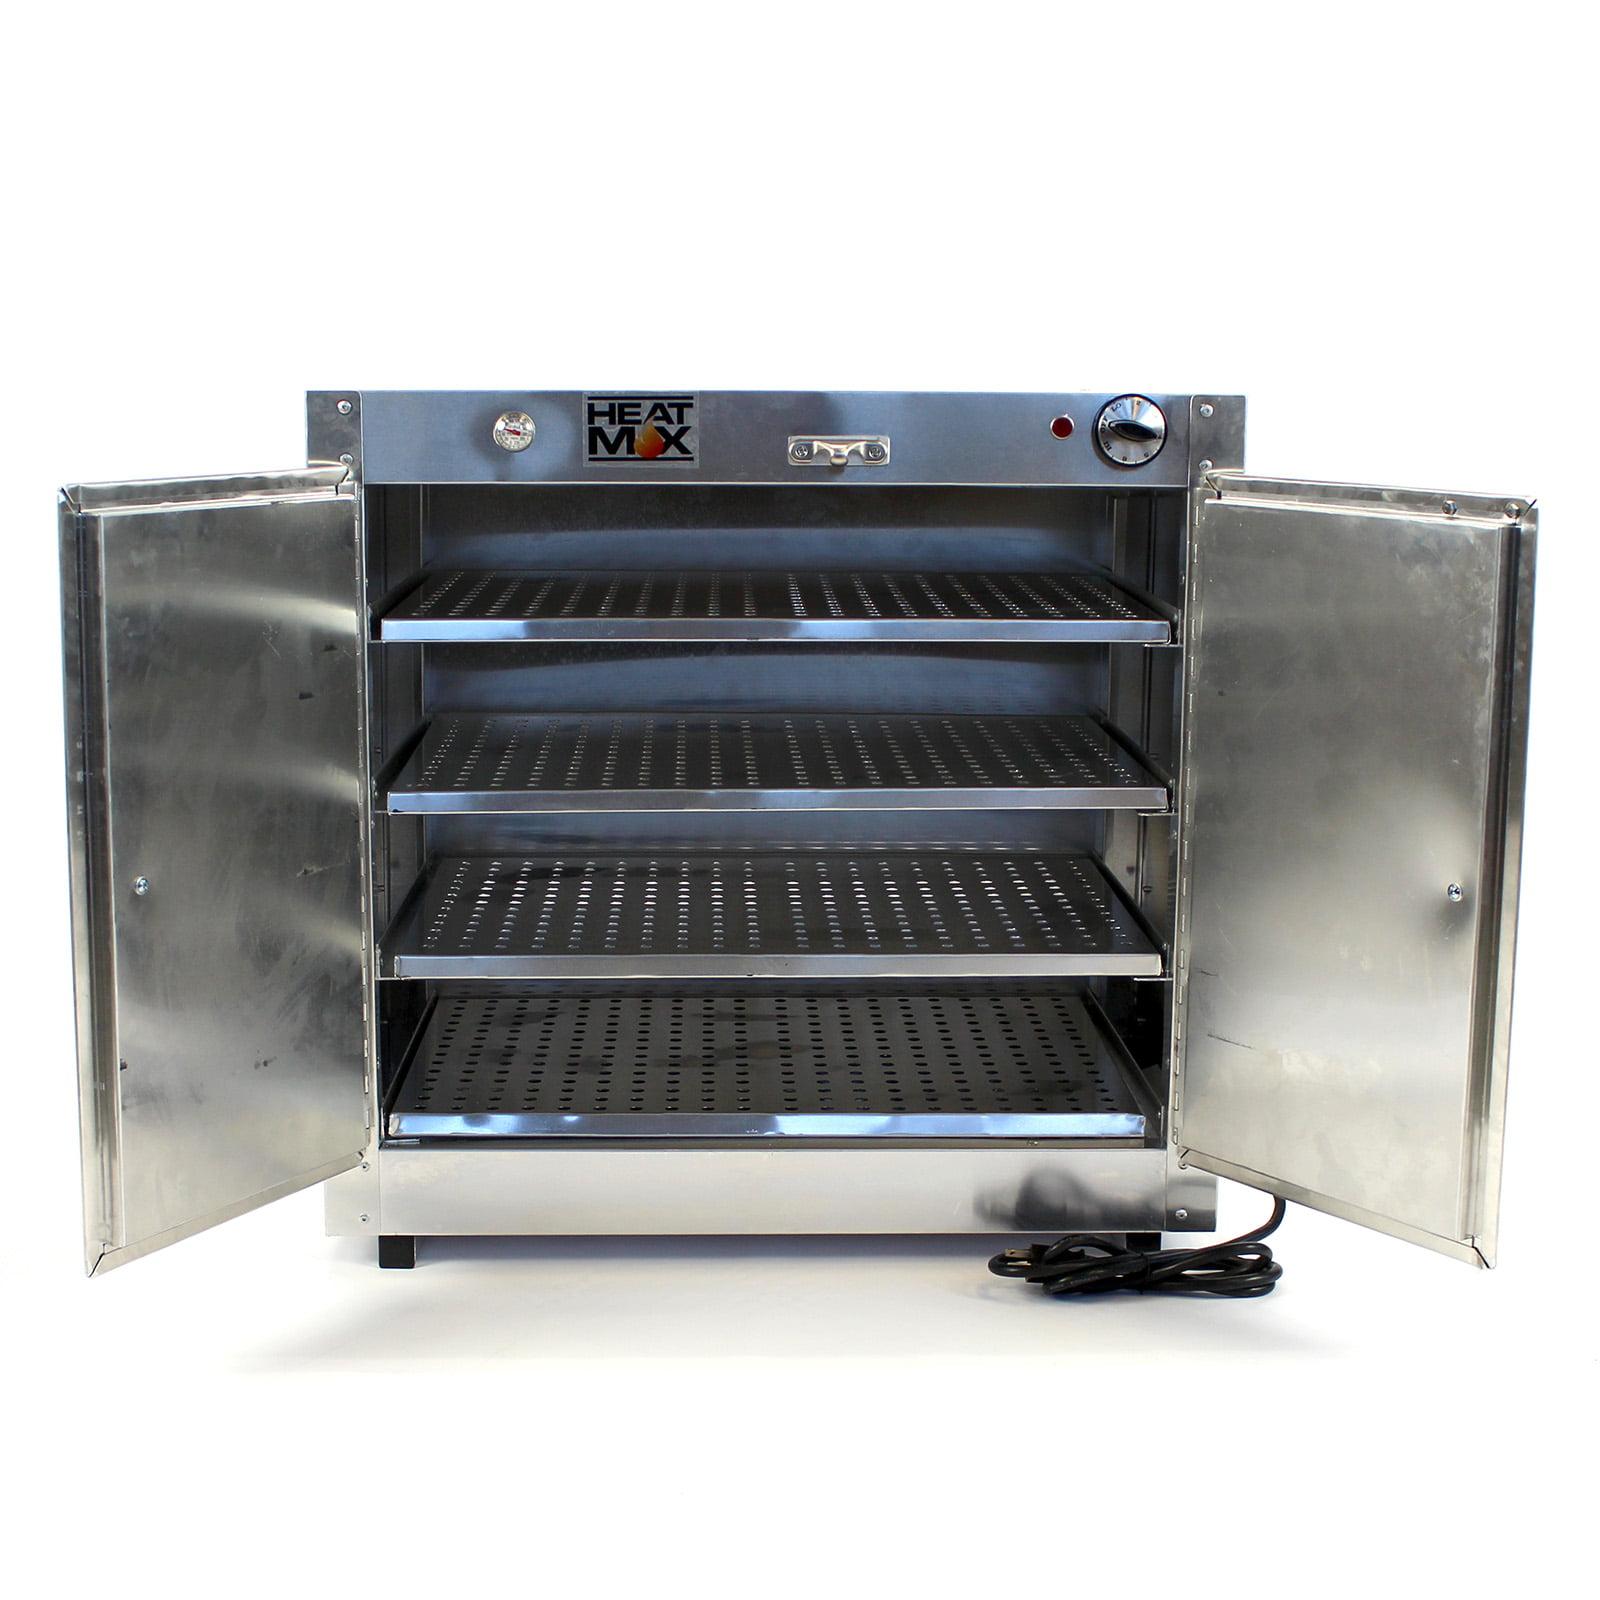 HeatMax Commercial Countertop Hot Box Cabinet Food Warmer 25 X 15 X 24  Display   Walmart.com